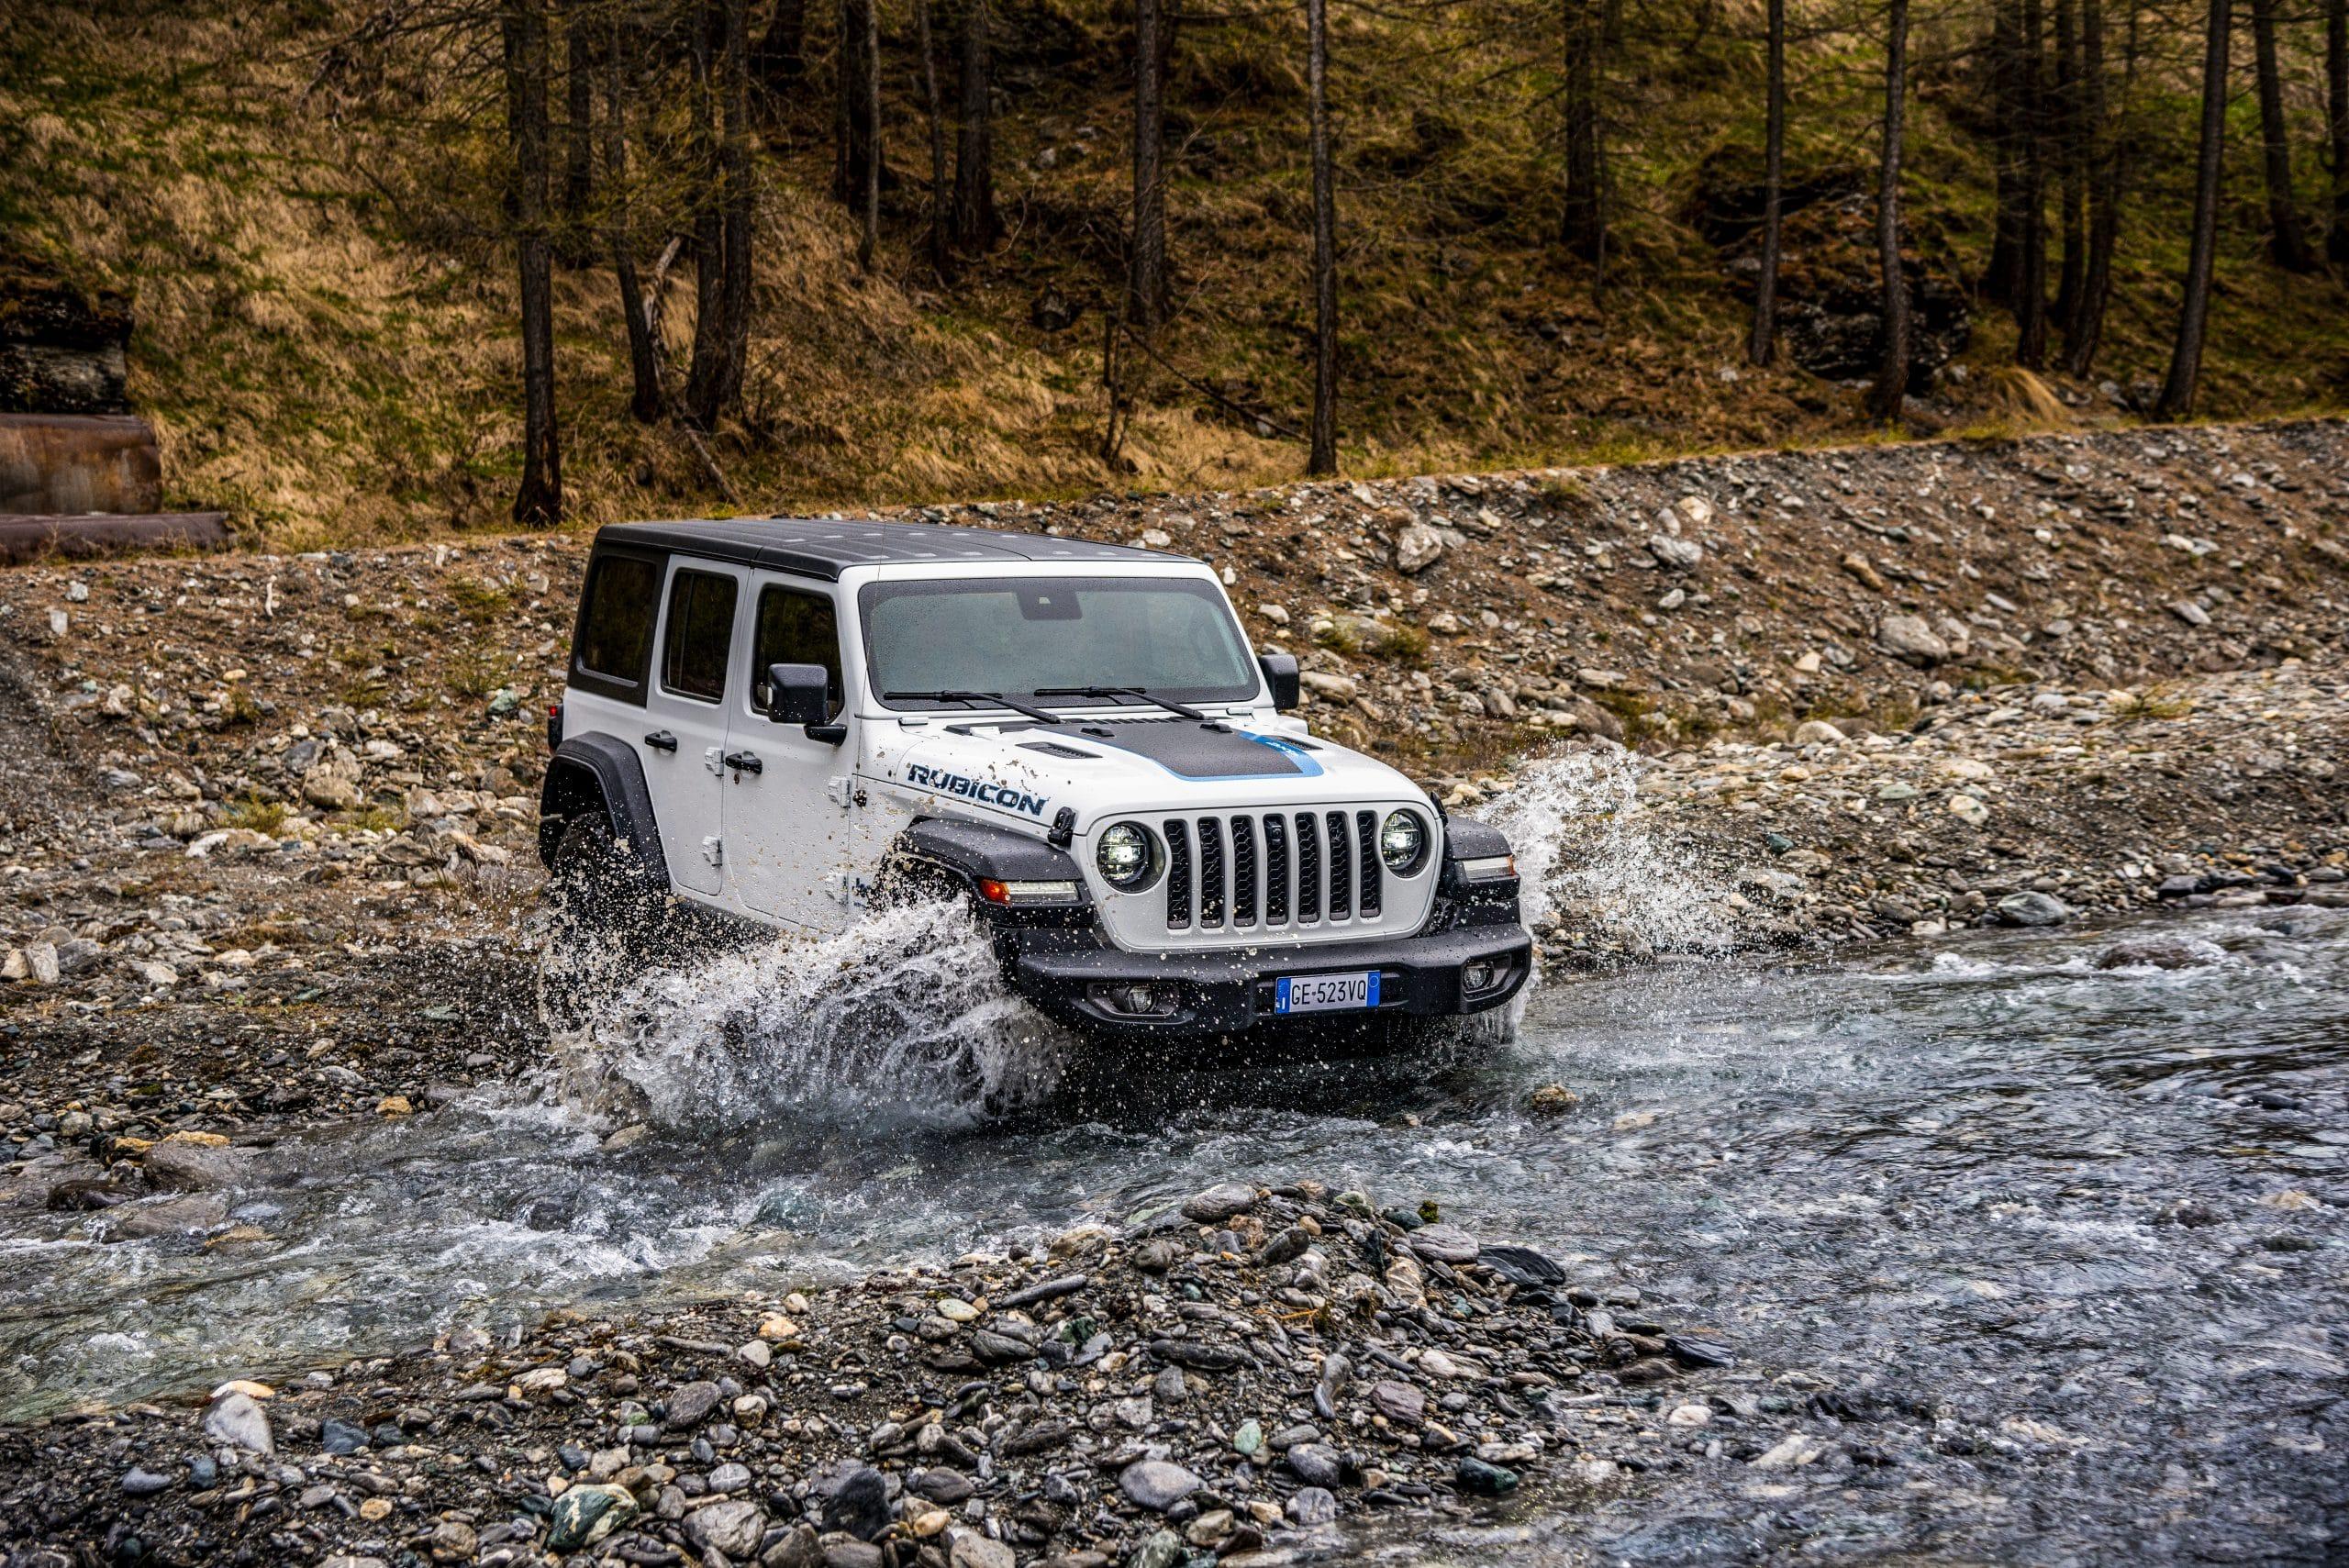 AFP9343 scaled H Jeep πρωταγωνιστεί στα φετινά OFF ROAD Magazine Awards Gladiator, Jeep, Jeep Compass, Jeep Gladiator, Jeep Renegade, Jeep Wrangler, Renegade, Wrangler, ειδήσεις, Νέα